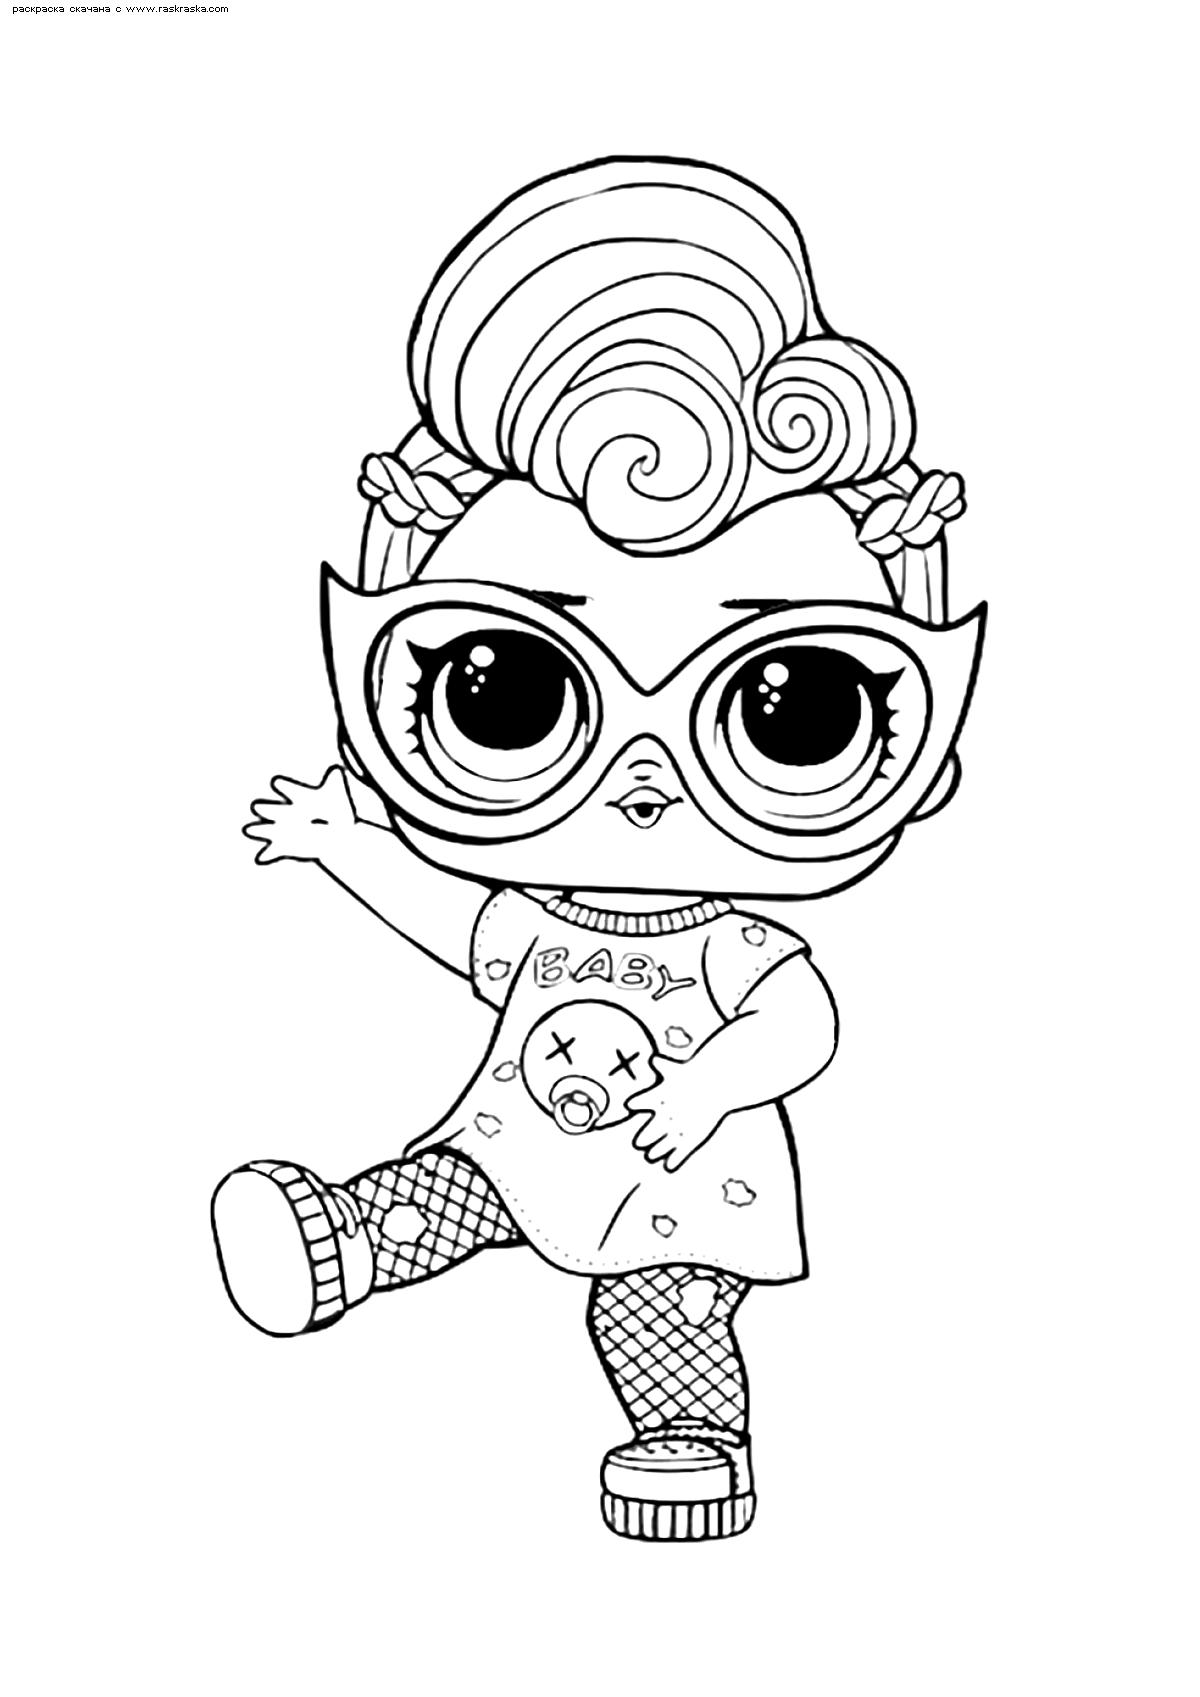 Раскраска ЛОЛ Grunge Grrrl конфетти поп (Девочка Гранж). Раскраска лол